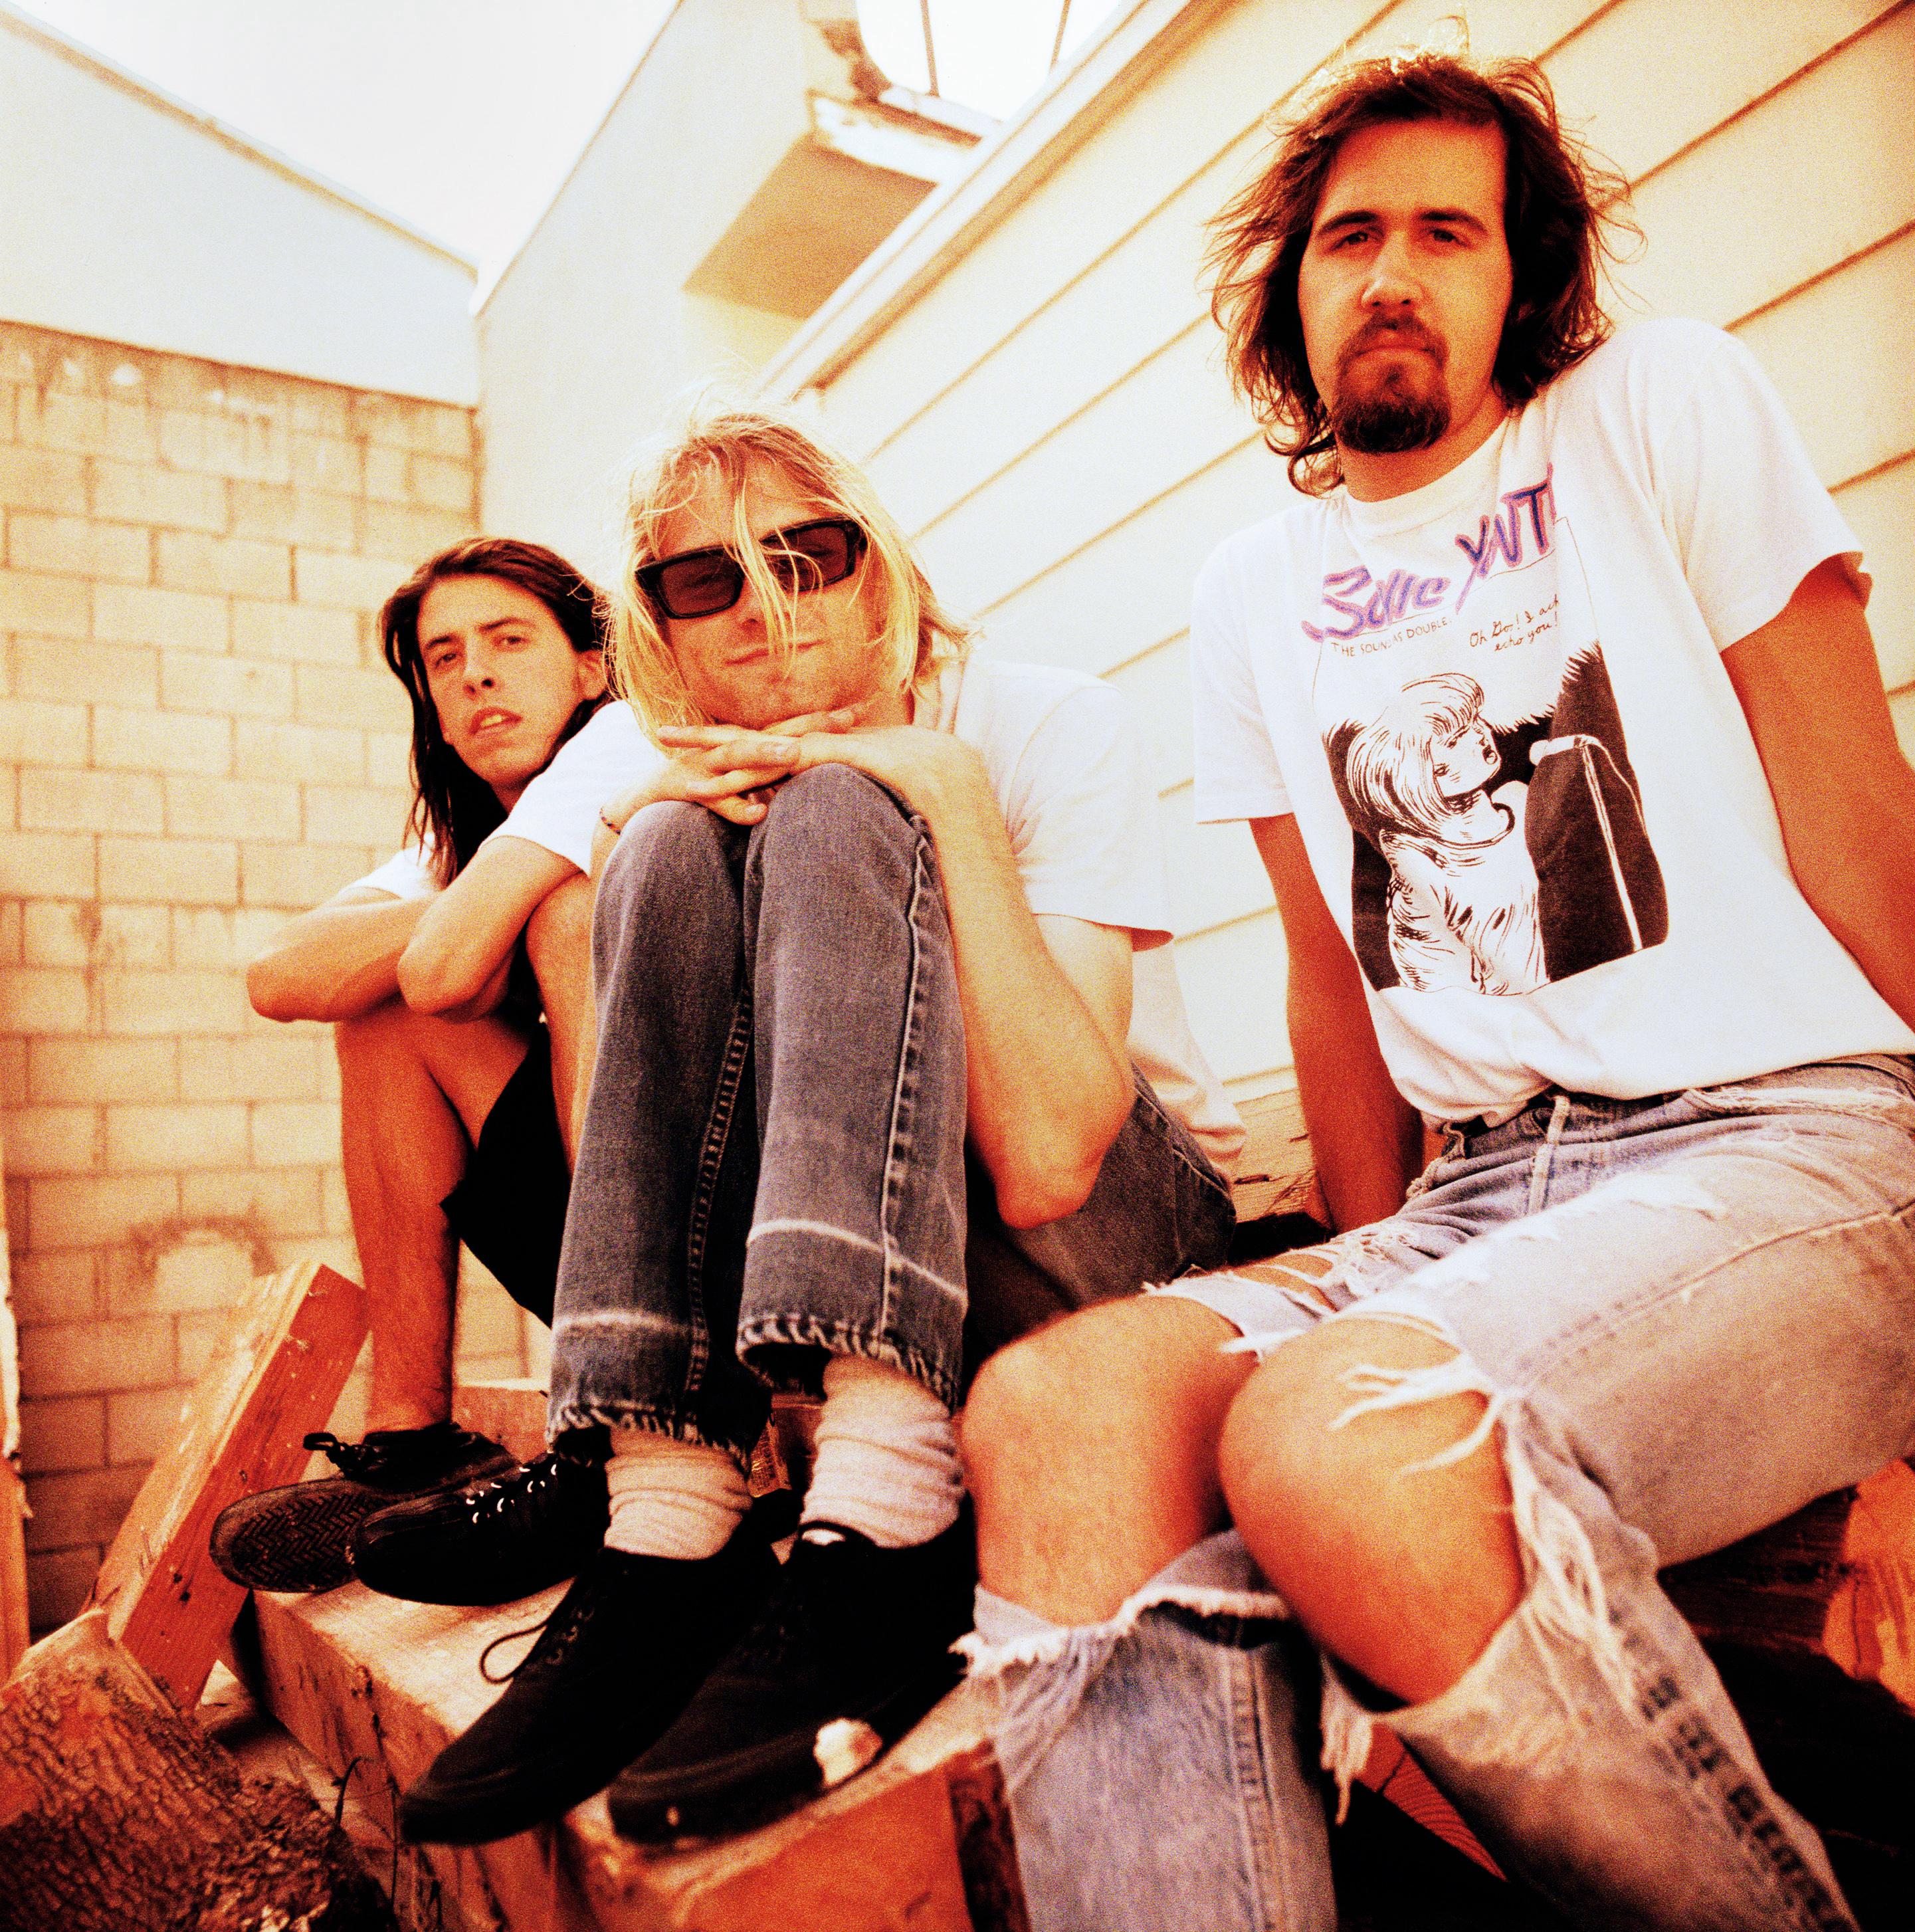 Nirvana's 'Nevermind' at 25: Krist Novoselic Ponders LP's Significance